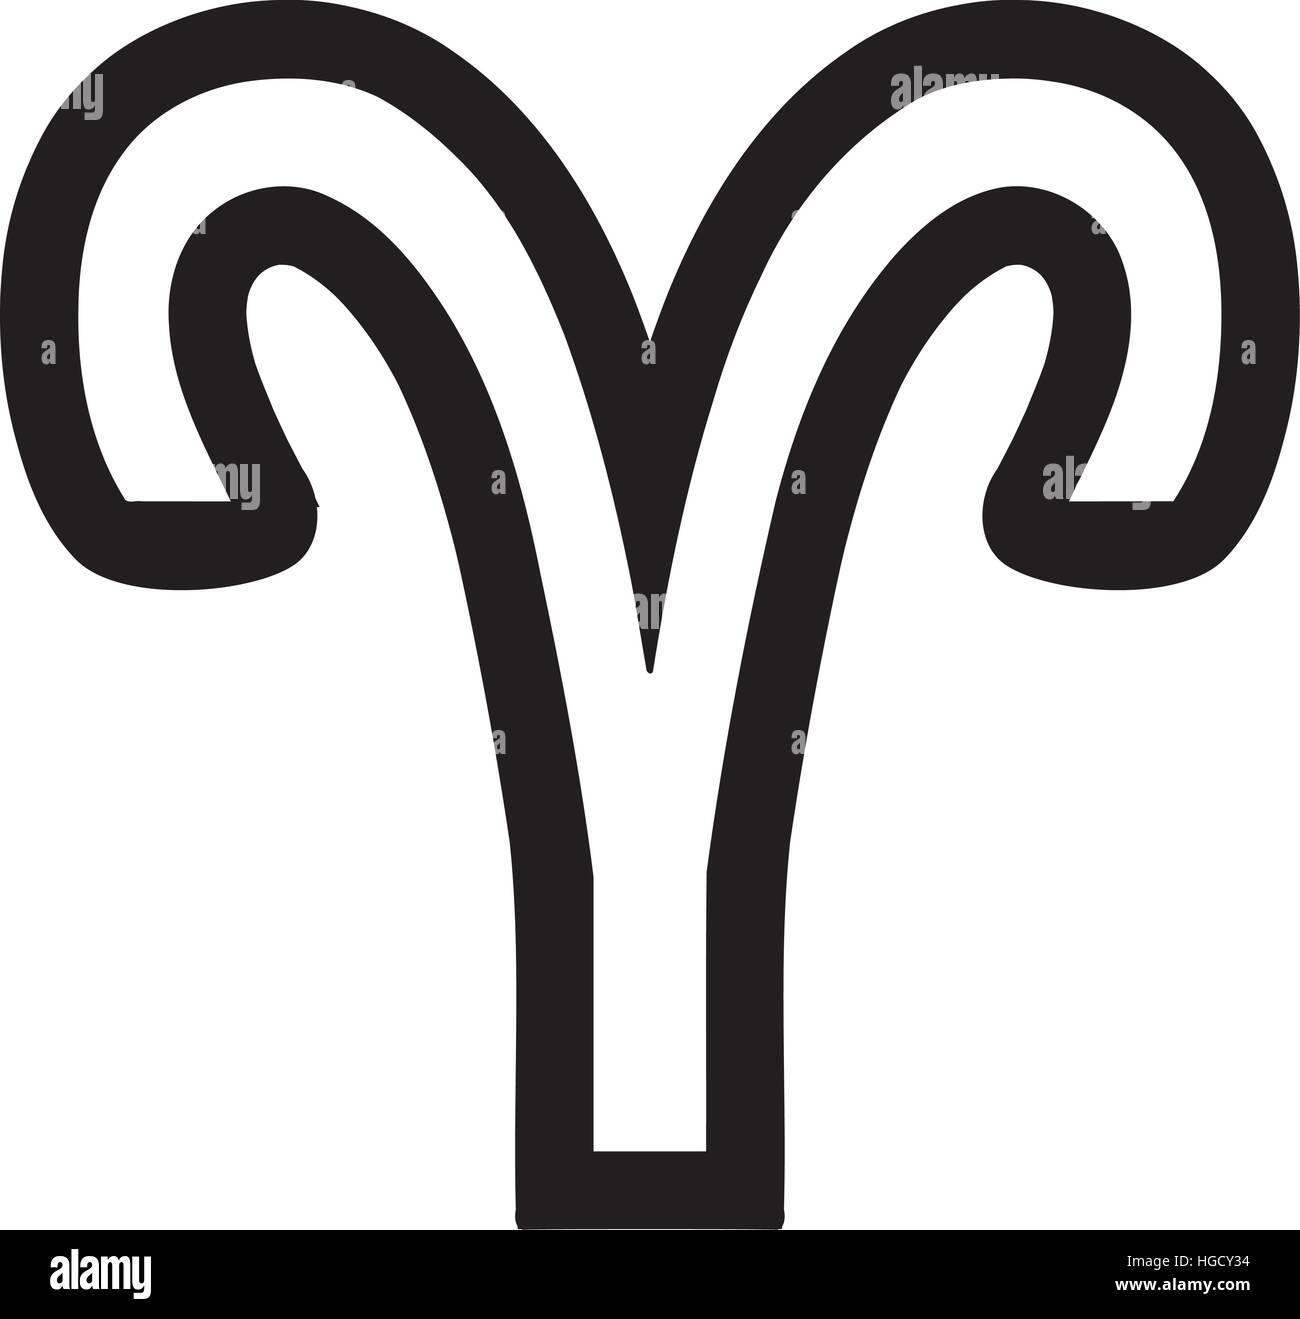 Aries Symbol Outline Wiring Diagrams Zodiac Sign Stock Vector Art Illustration Rh Alamy Com Tribal Tattoo Designs